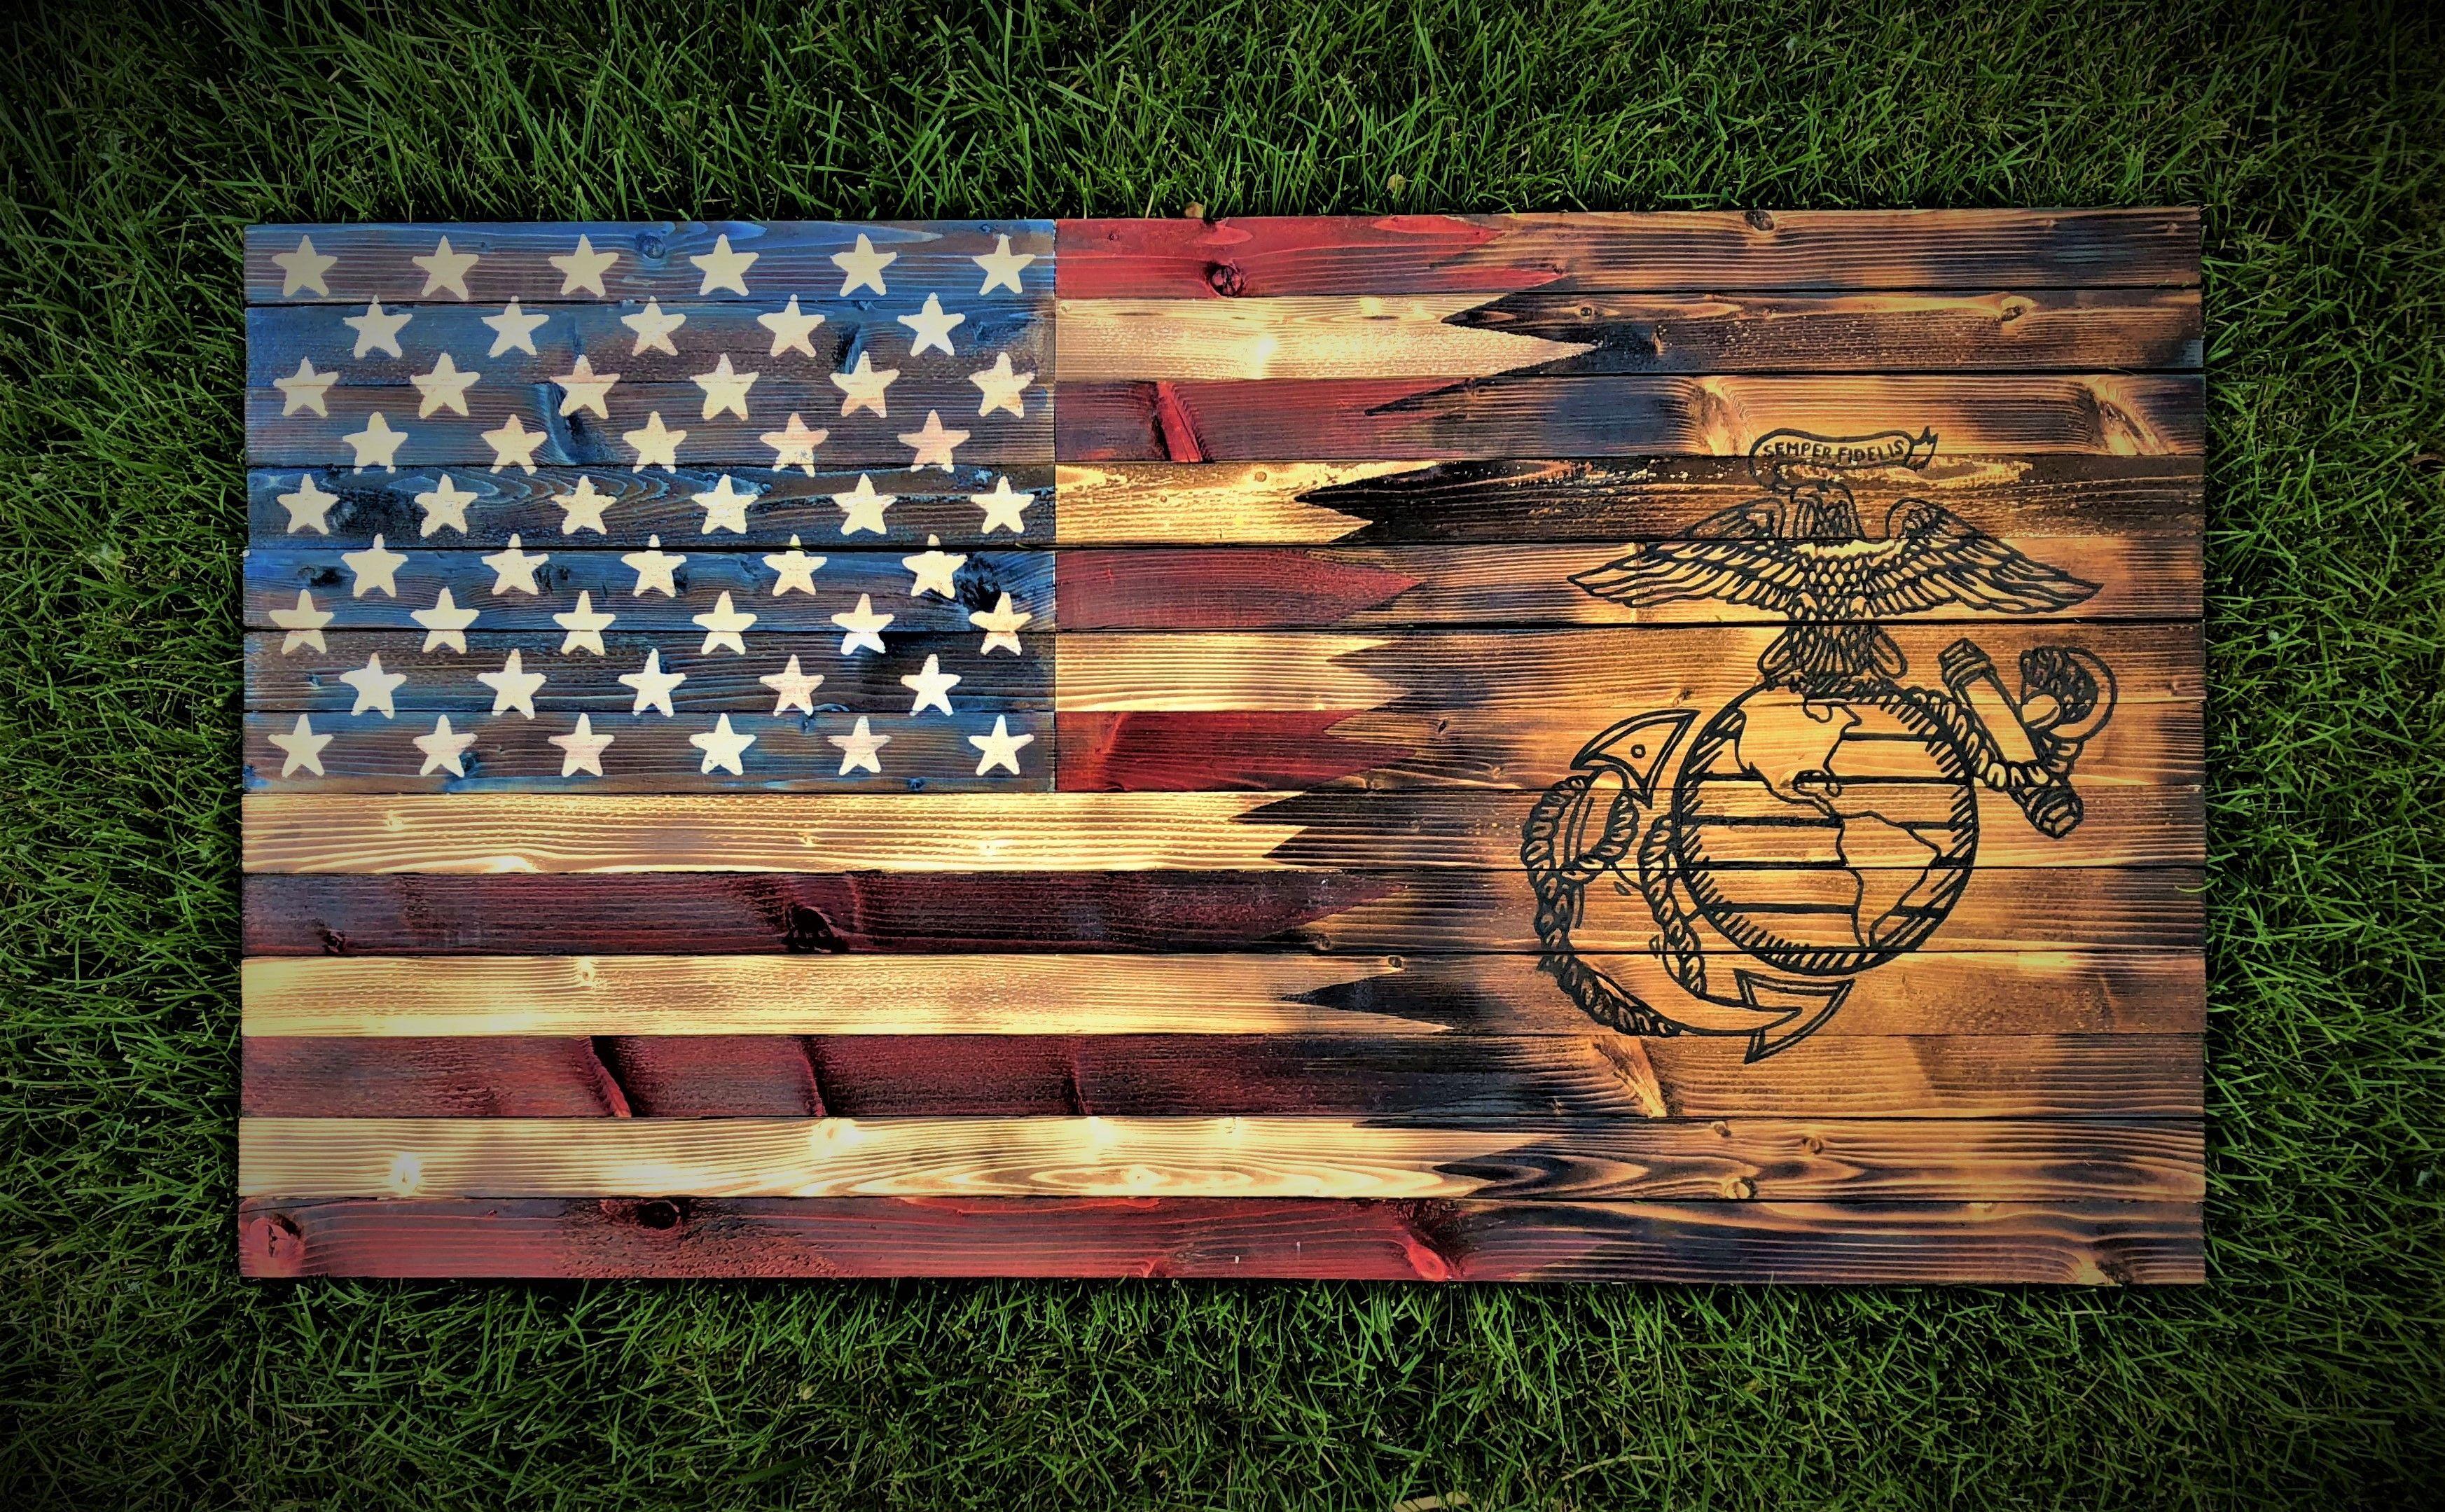 Rustic Charred American Marine Flag Rustic American Flag American Flag Wood Wooden Flag